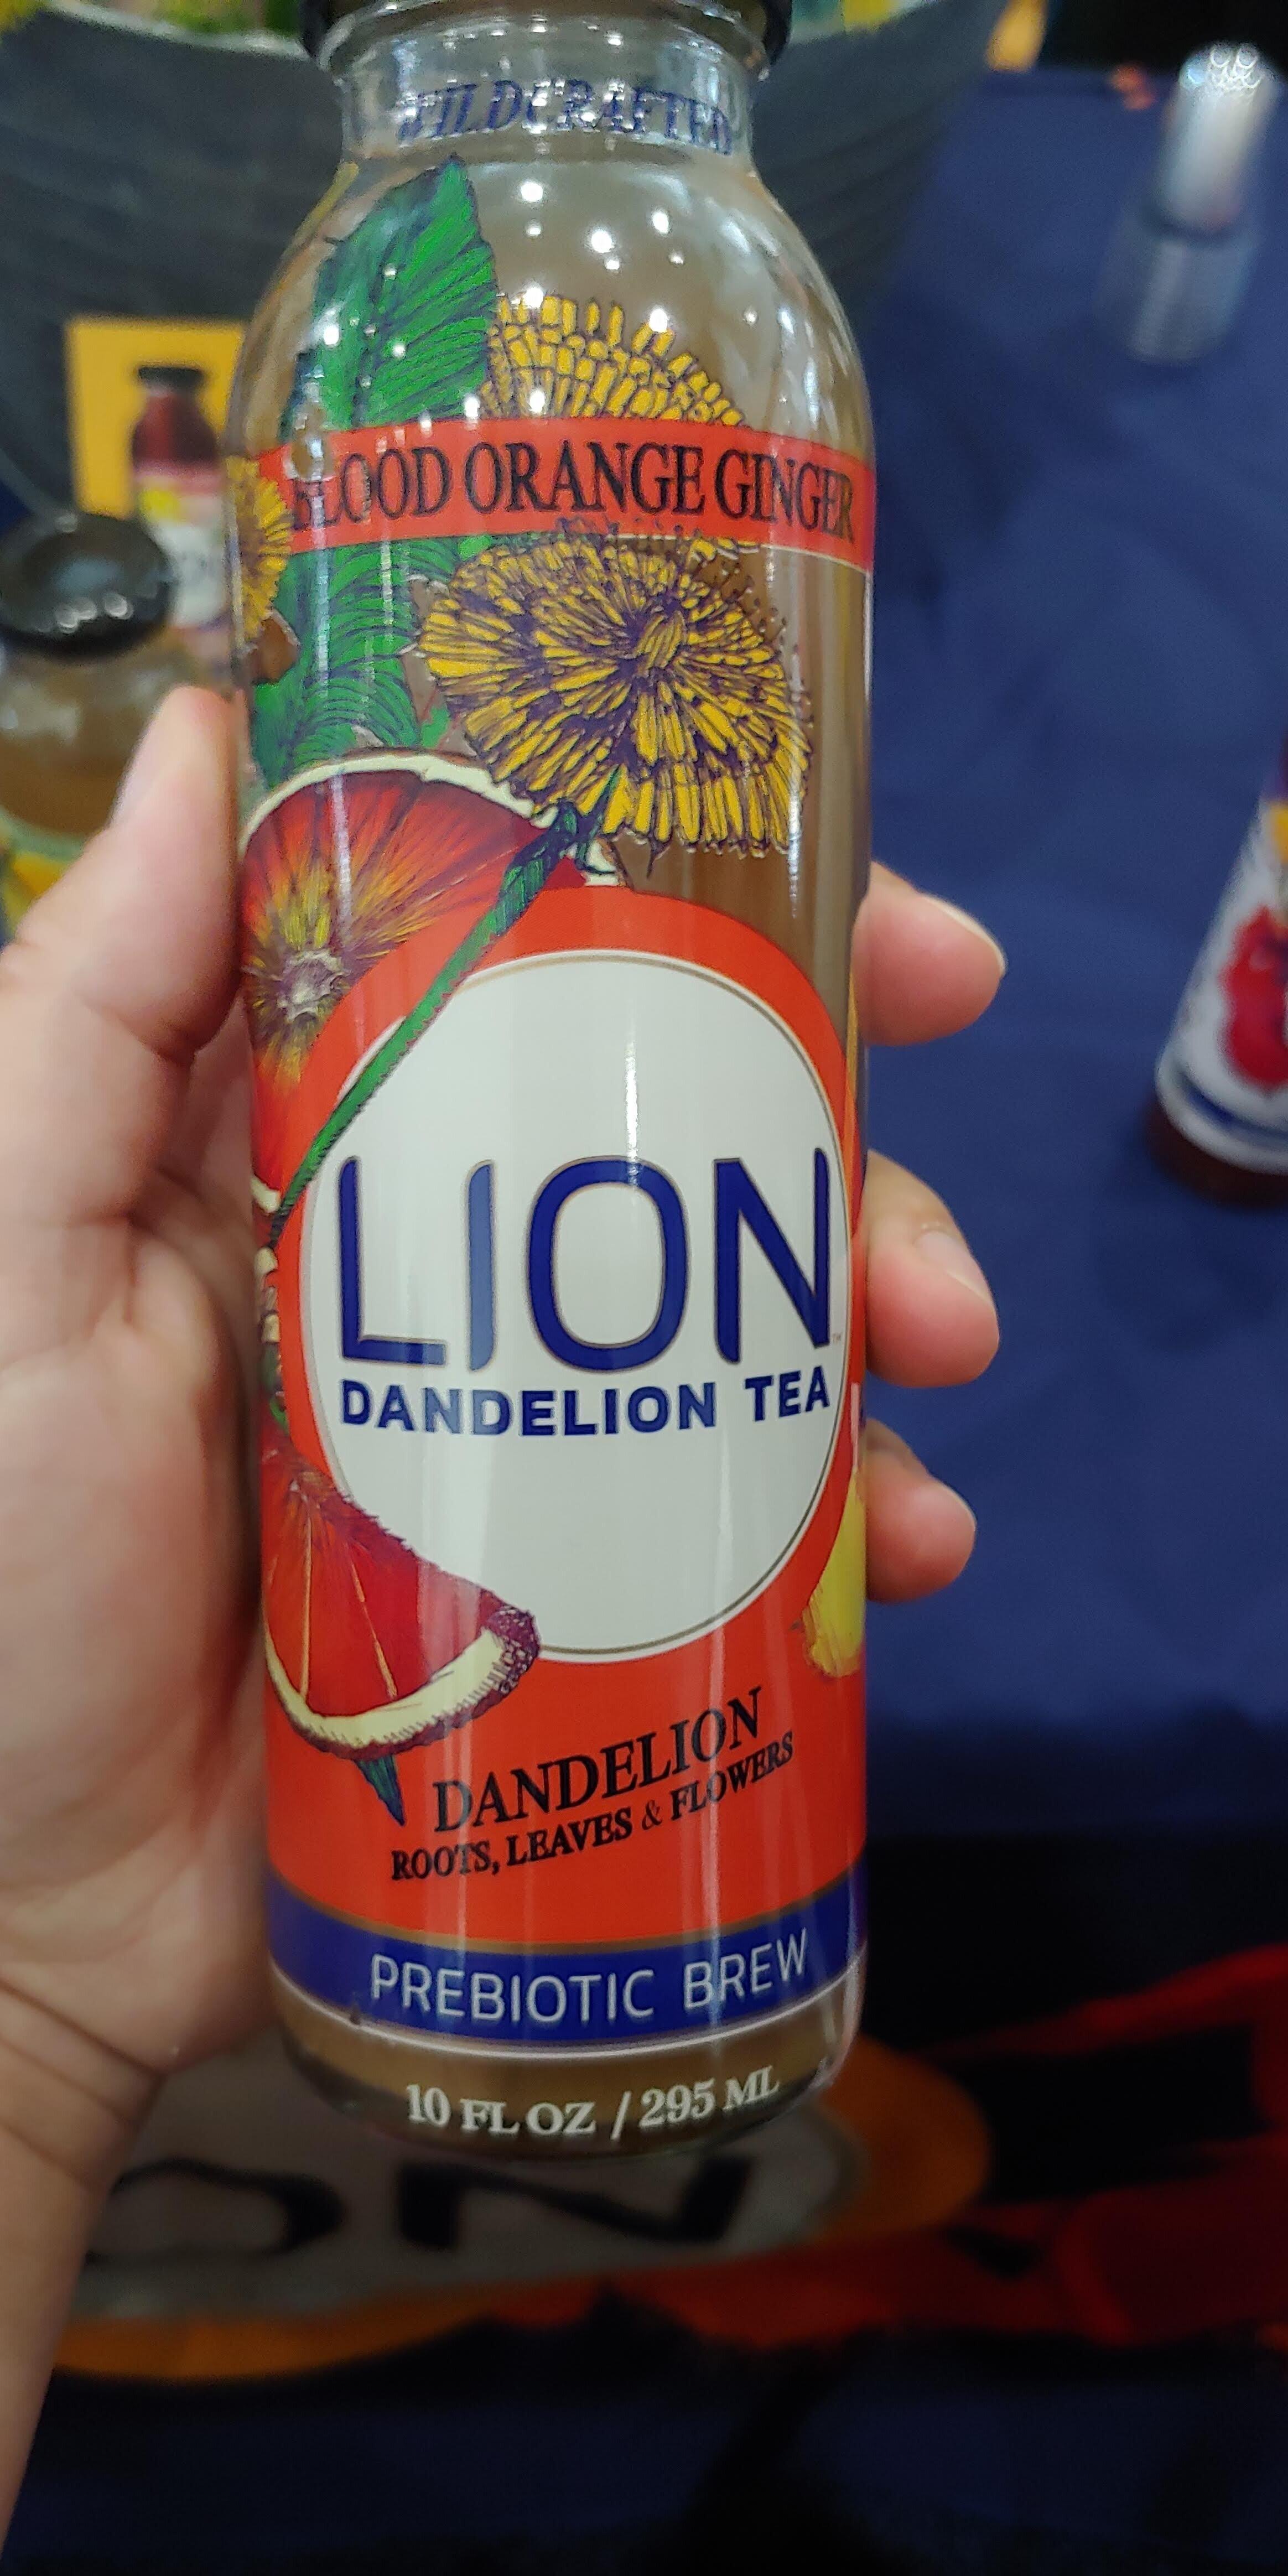 Delicious bitter tea of dandelion leaf & root.